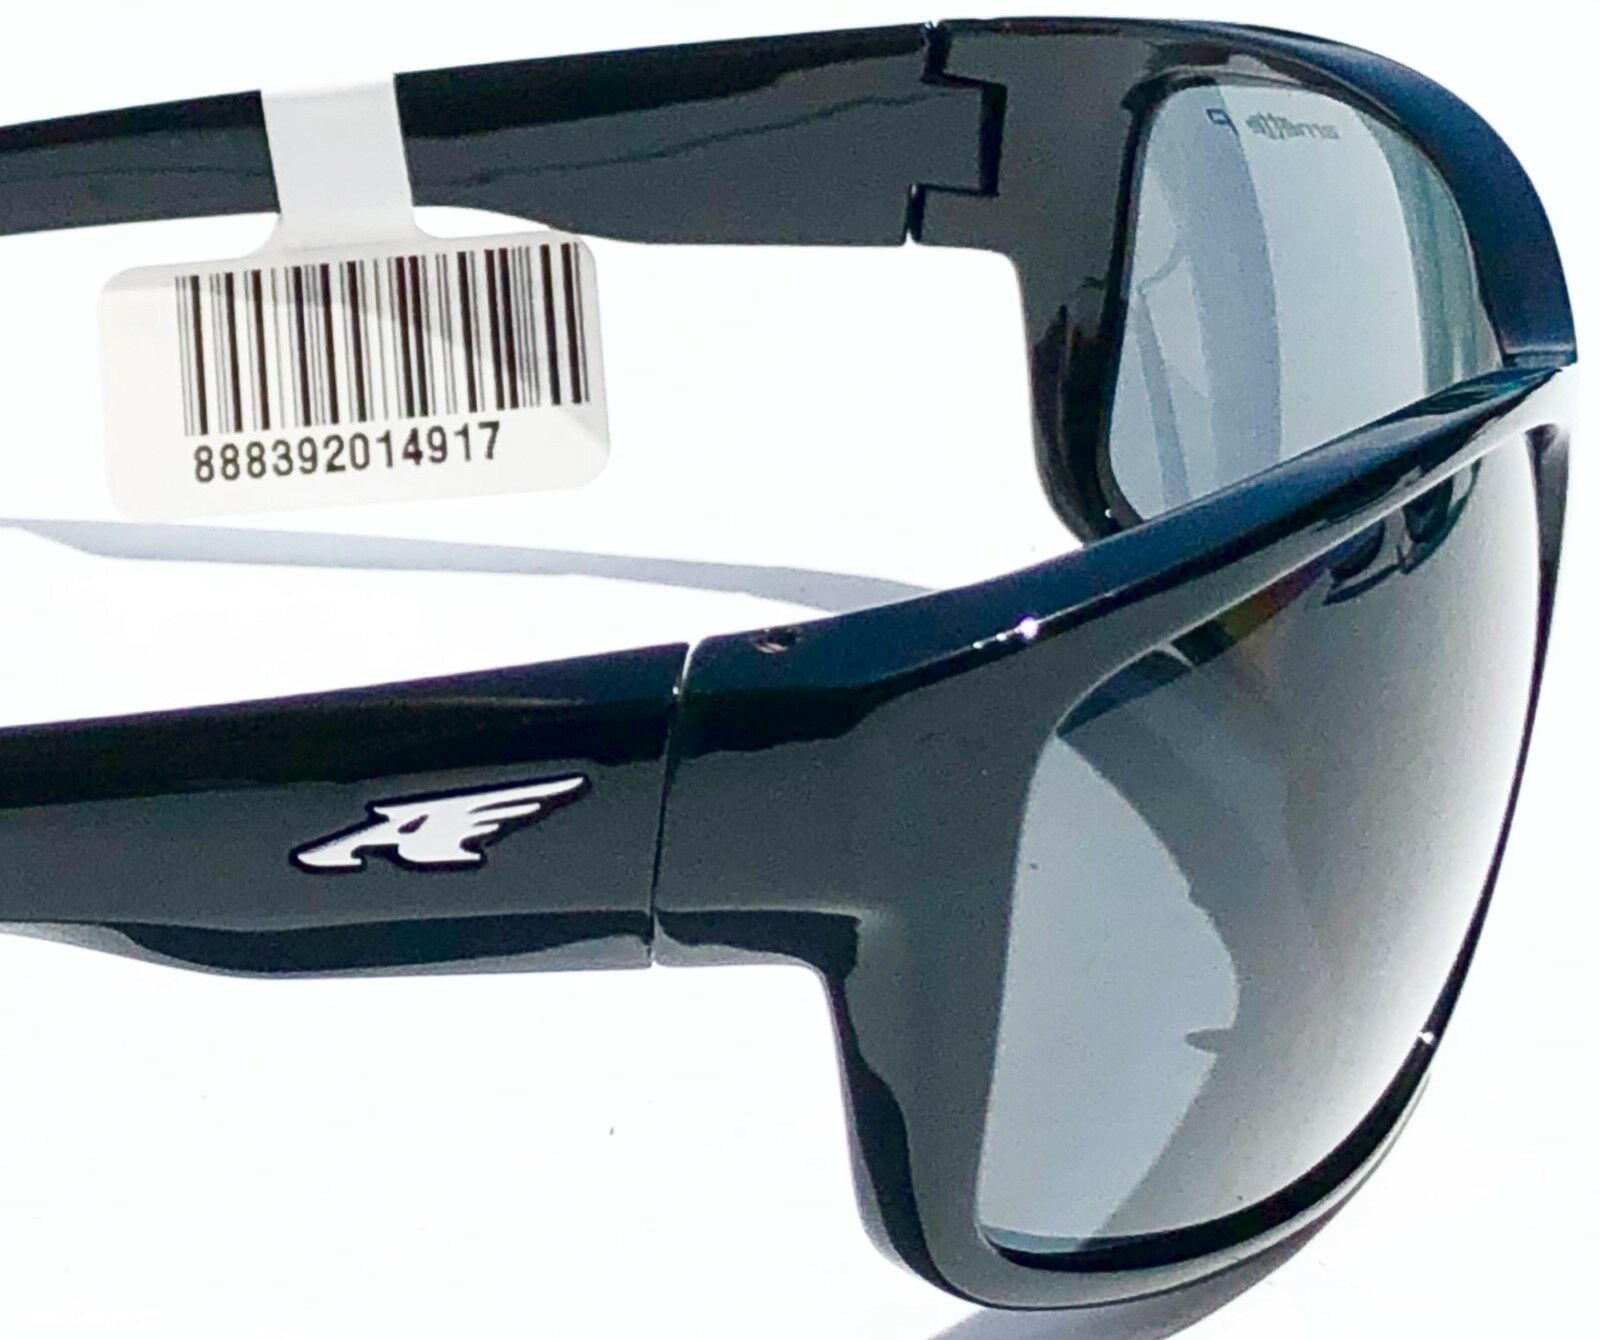 08e4193b79dfd New  Arnette Fastball in Black Sport Polarized Grey Sunglass 4202-2267 for  sale online